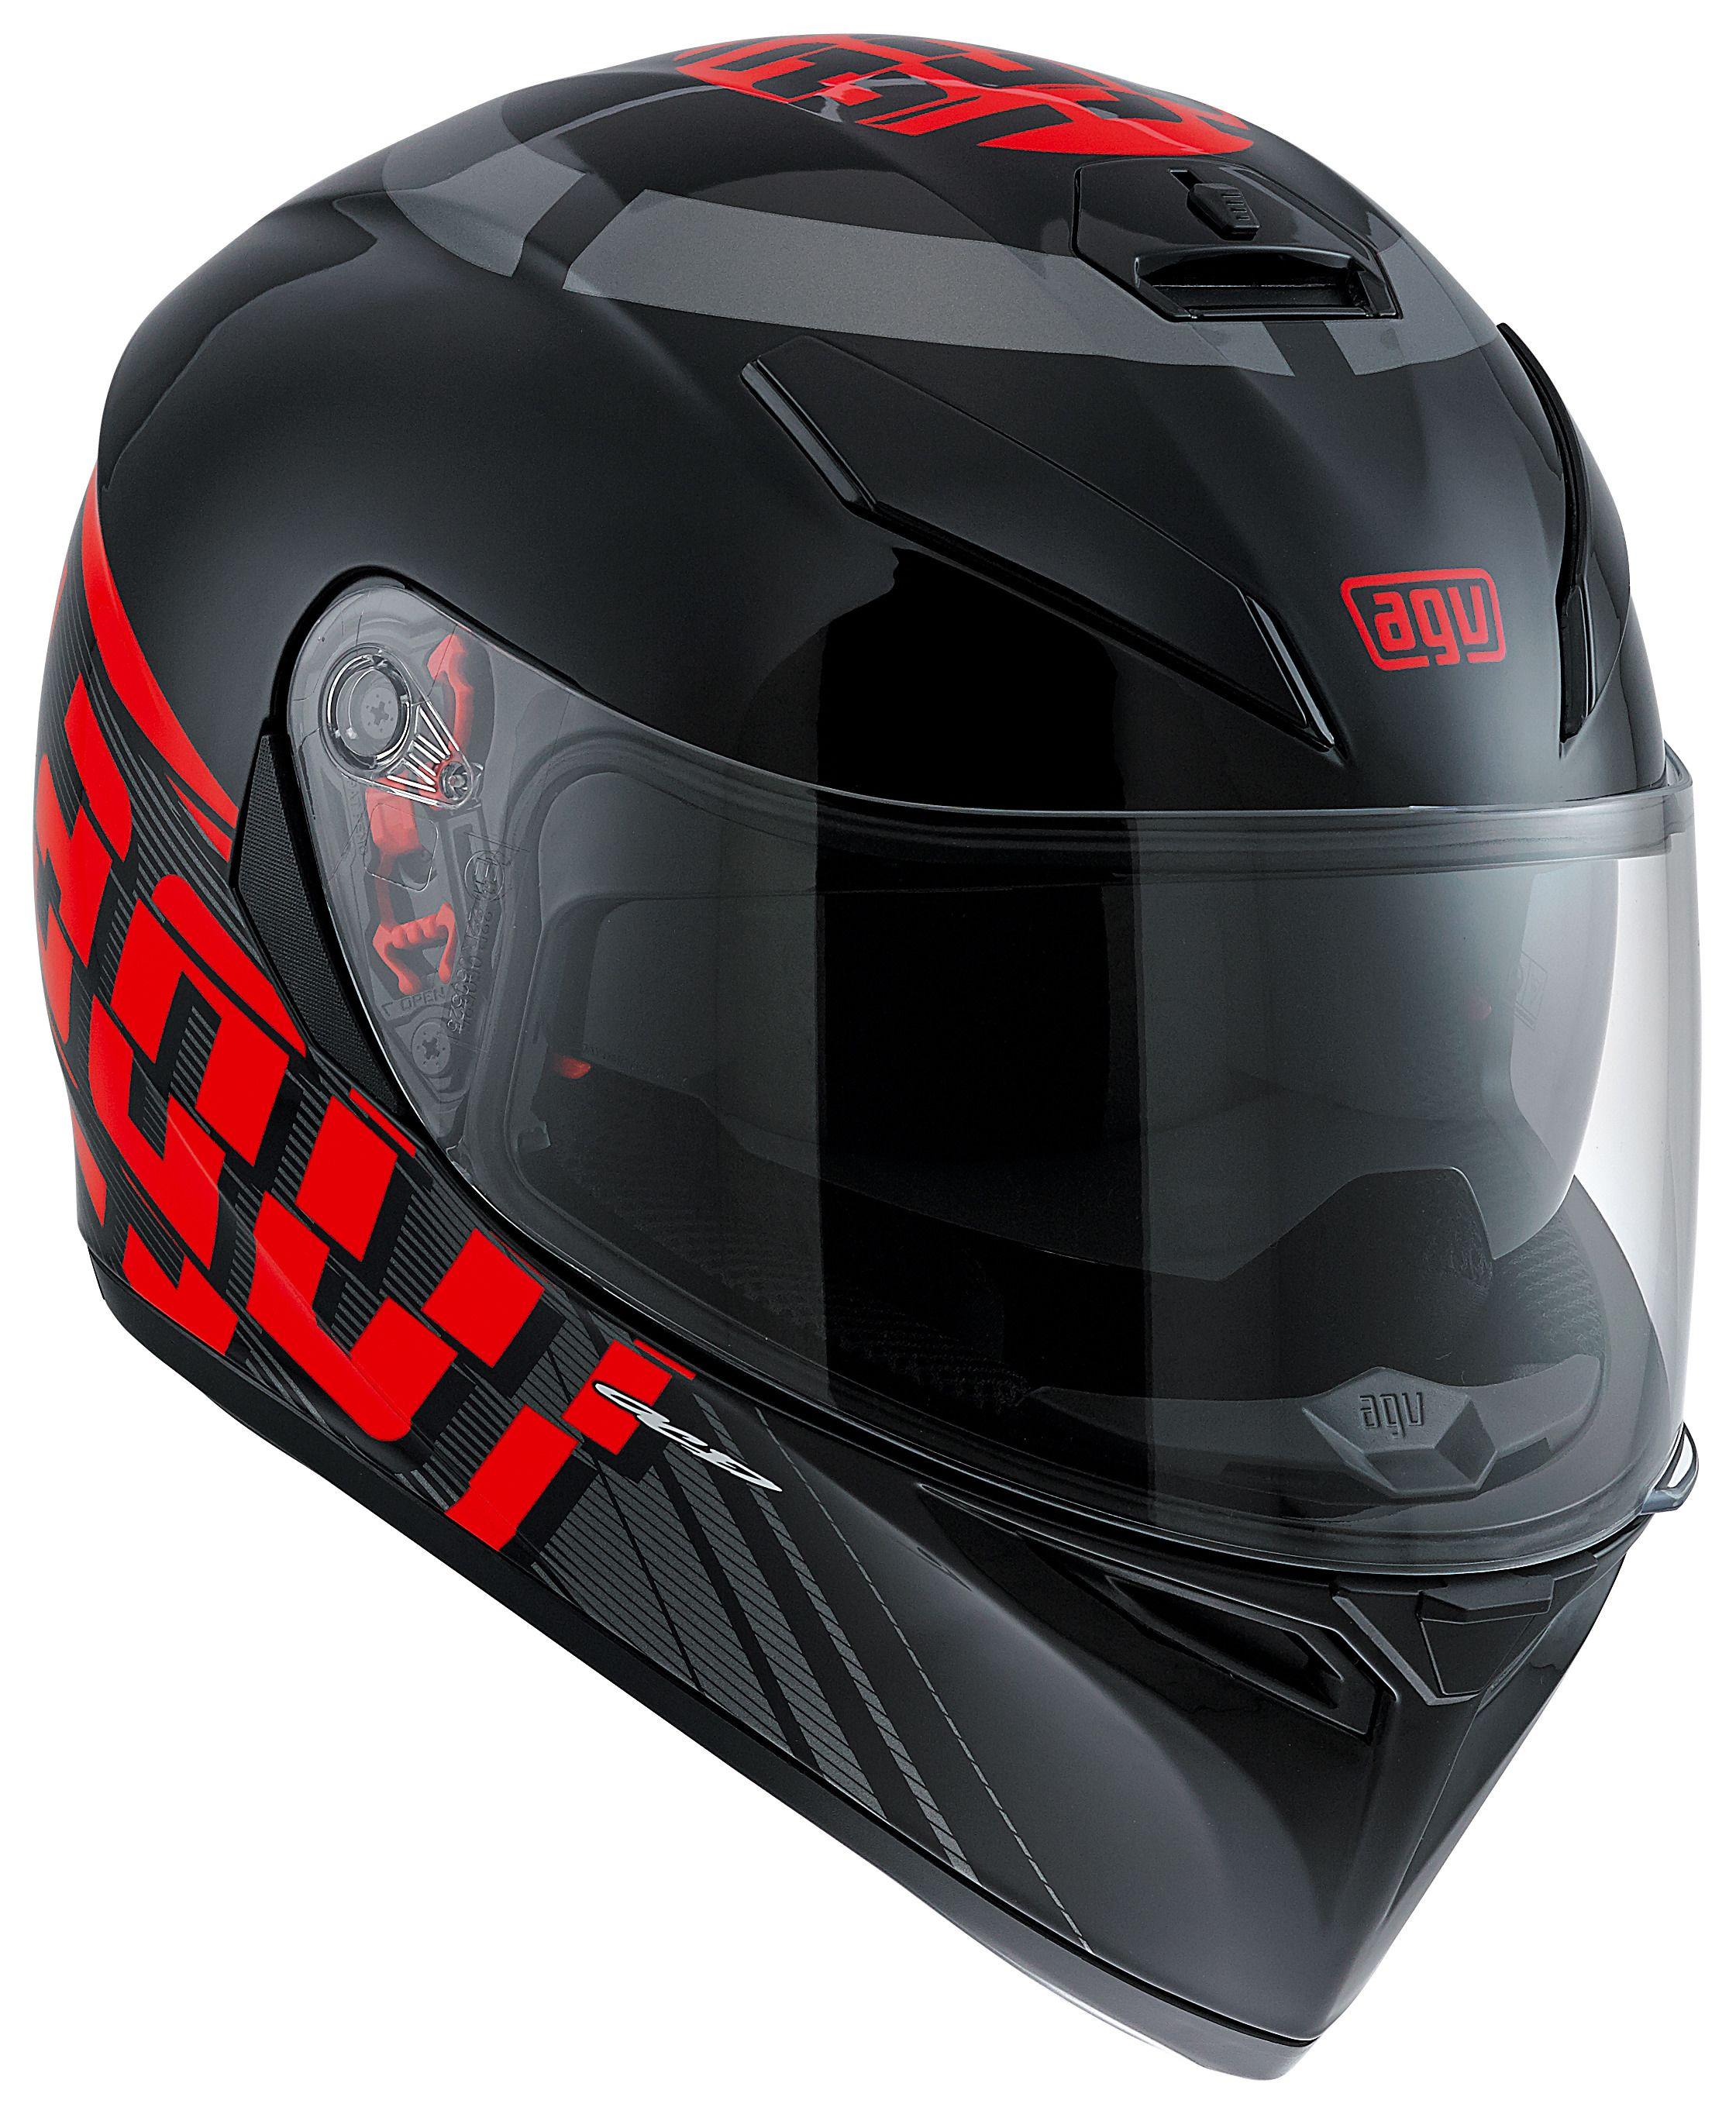 AGV K3 SV Helmet Review - Knee Down Reviews